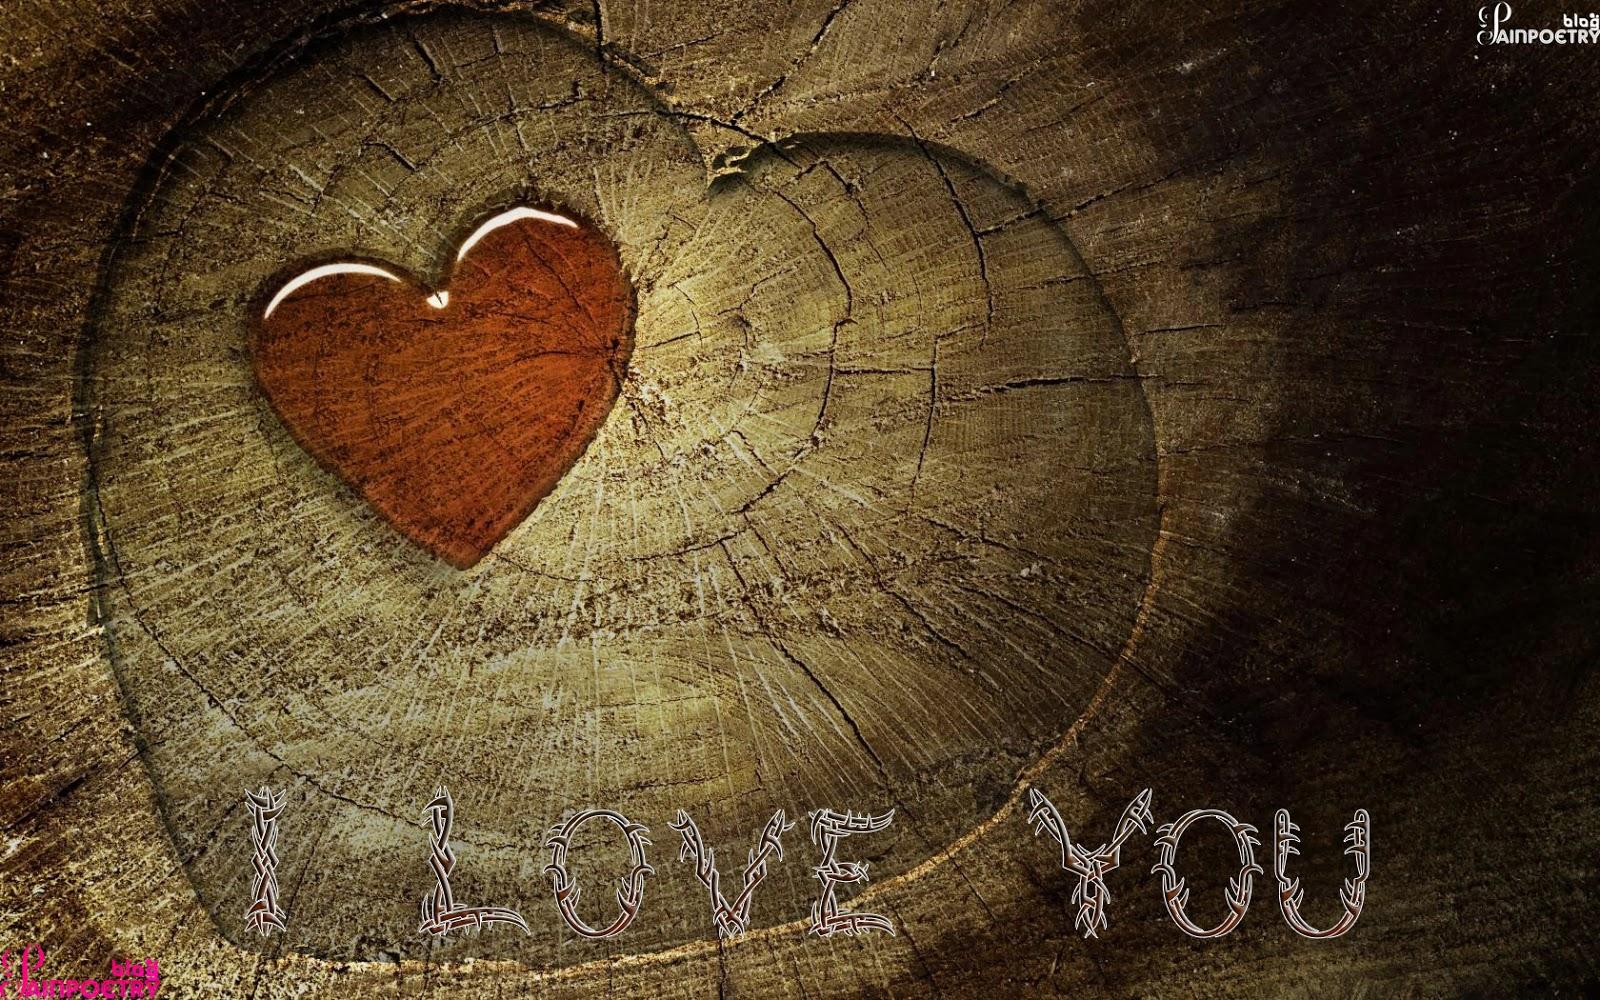 Love-Heart-On-Wood-Image-HD